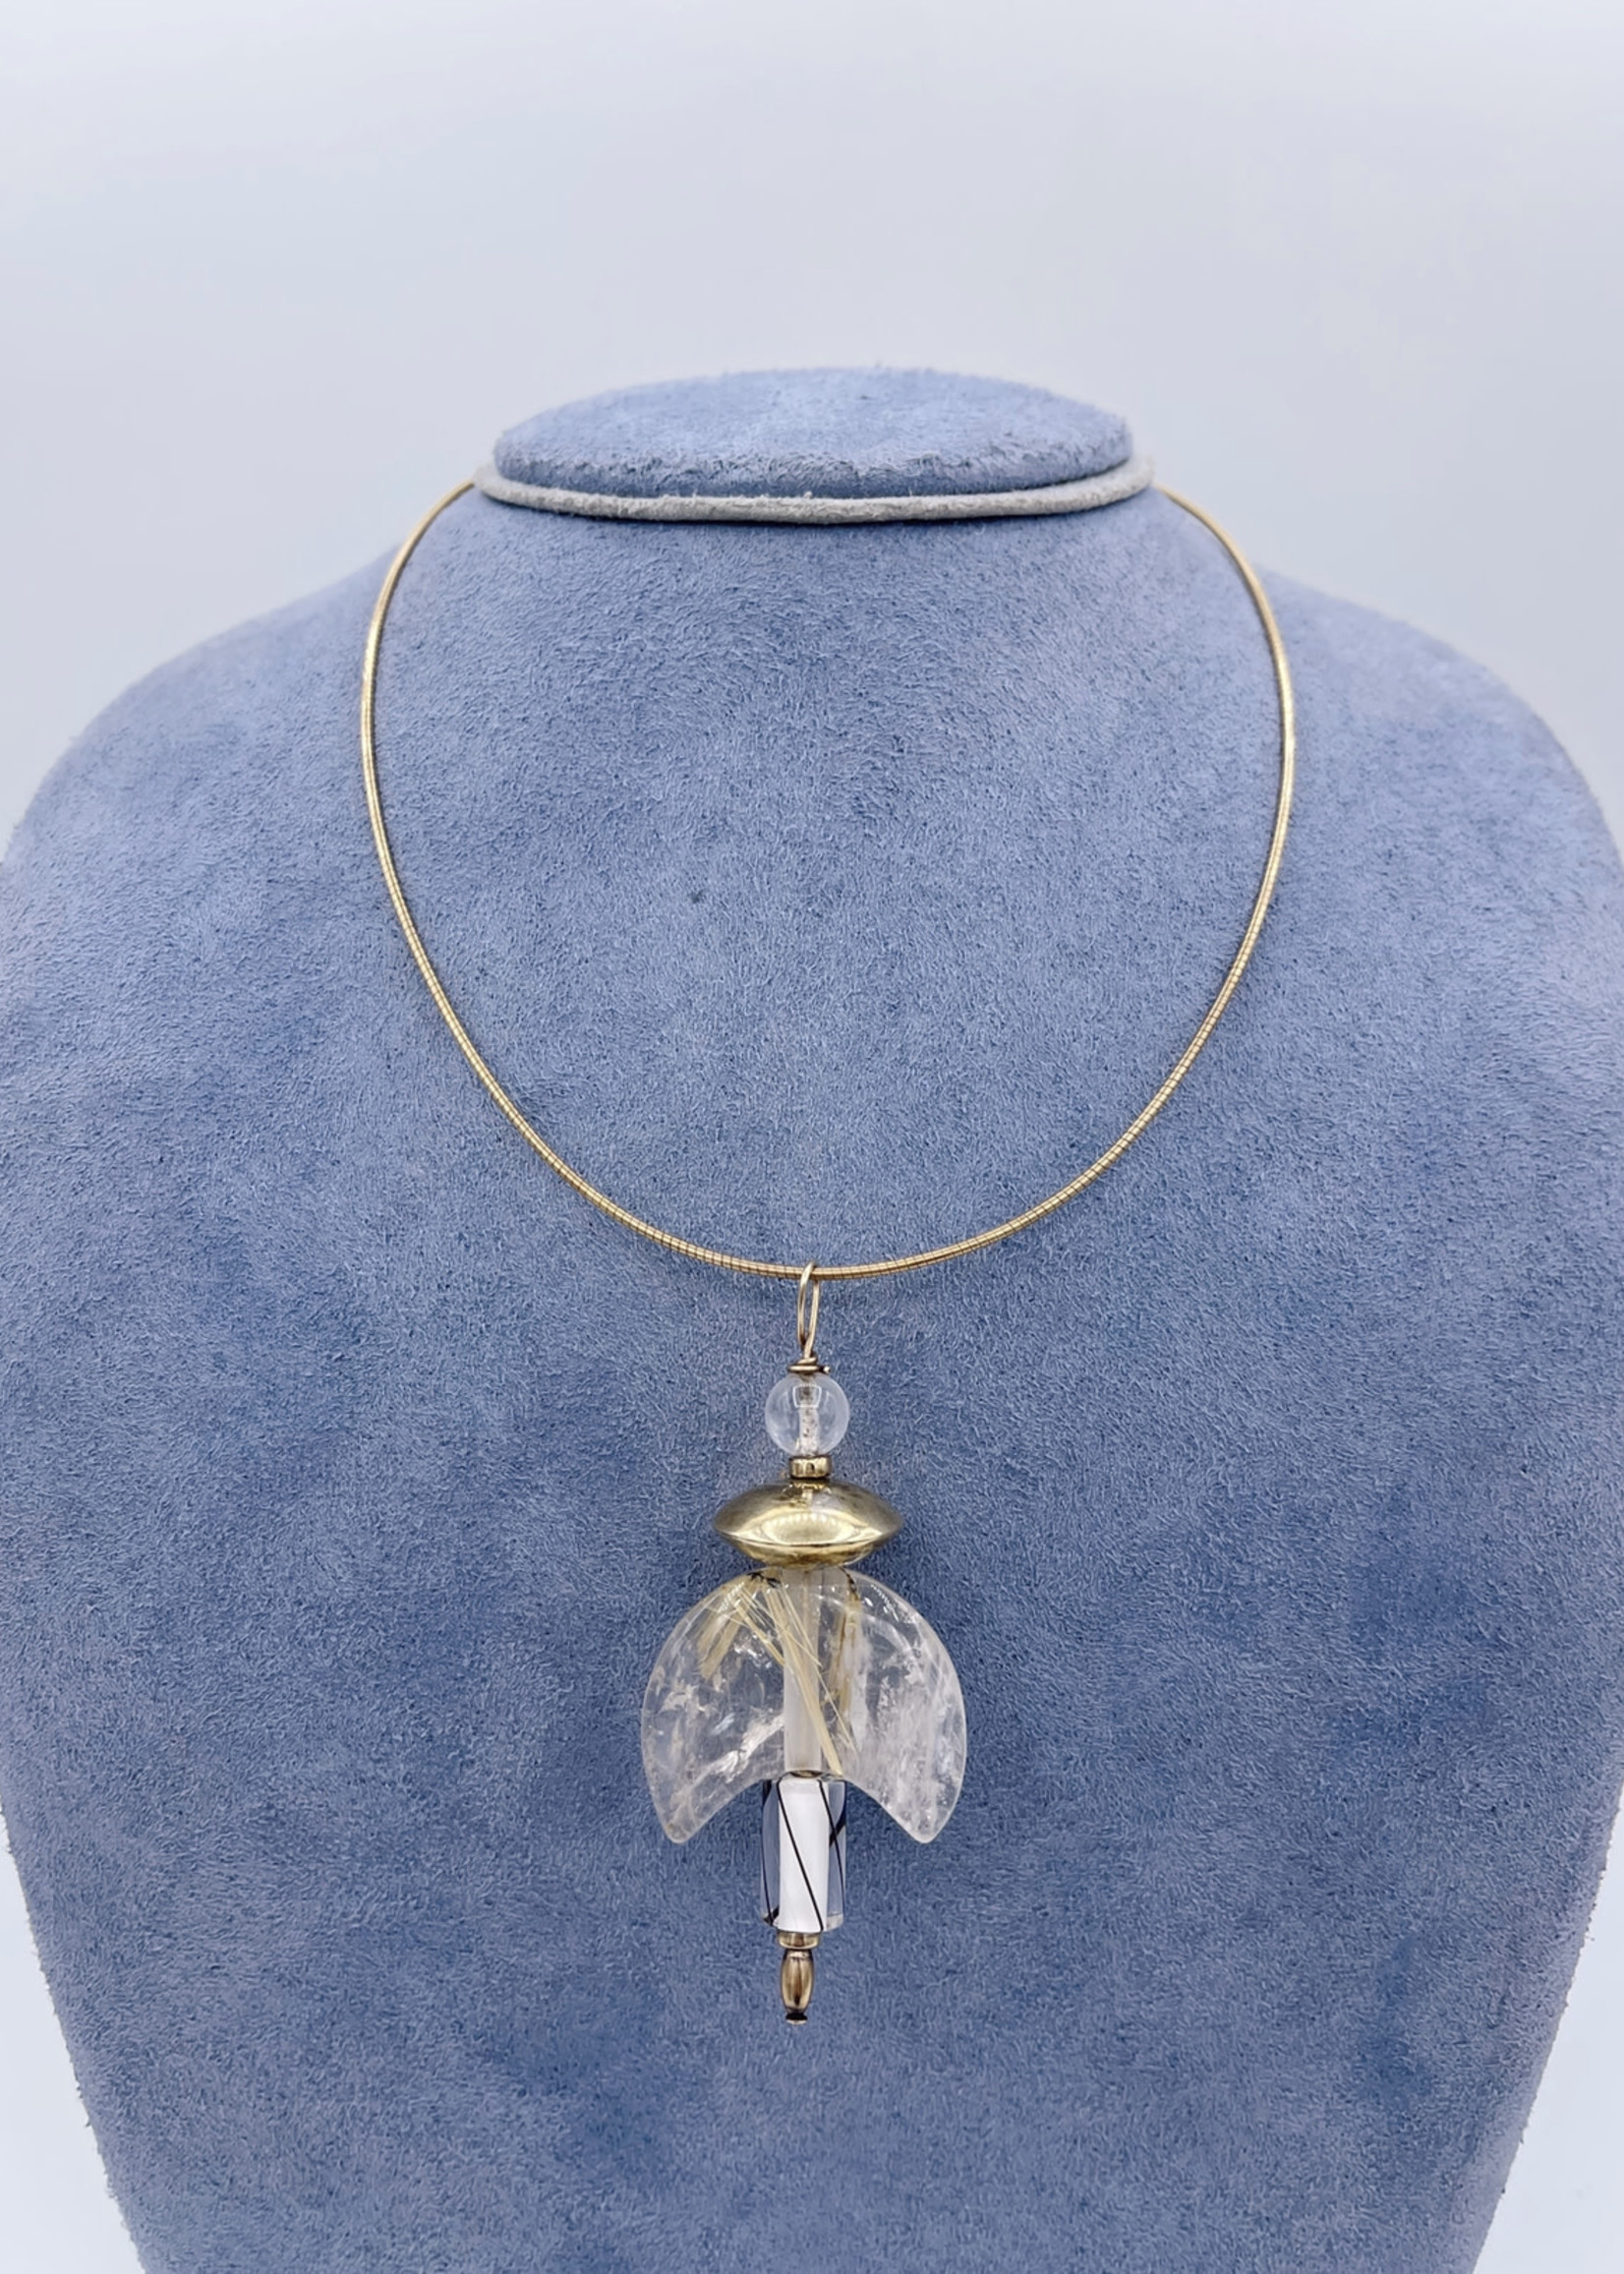 CJ Designs Moonstone Necklace w/ Chain 14k Yellow